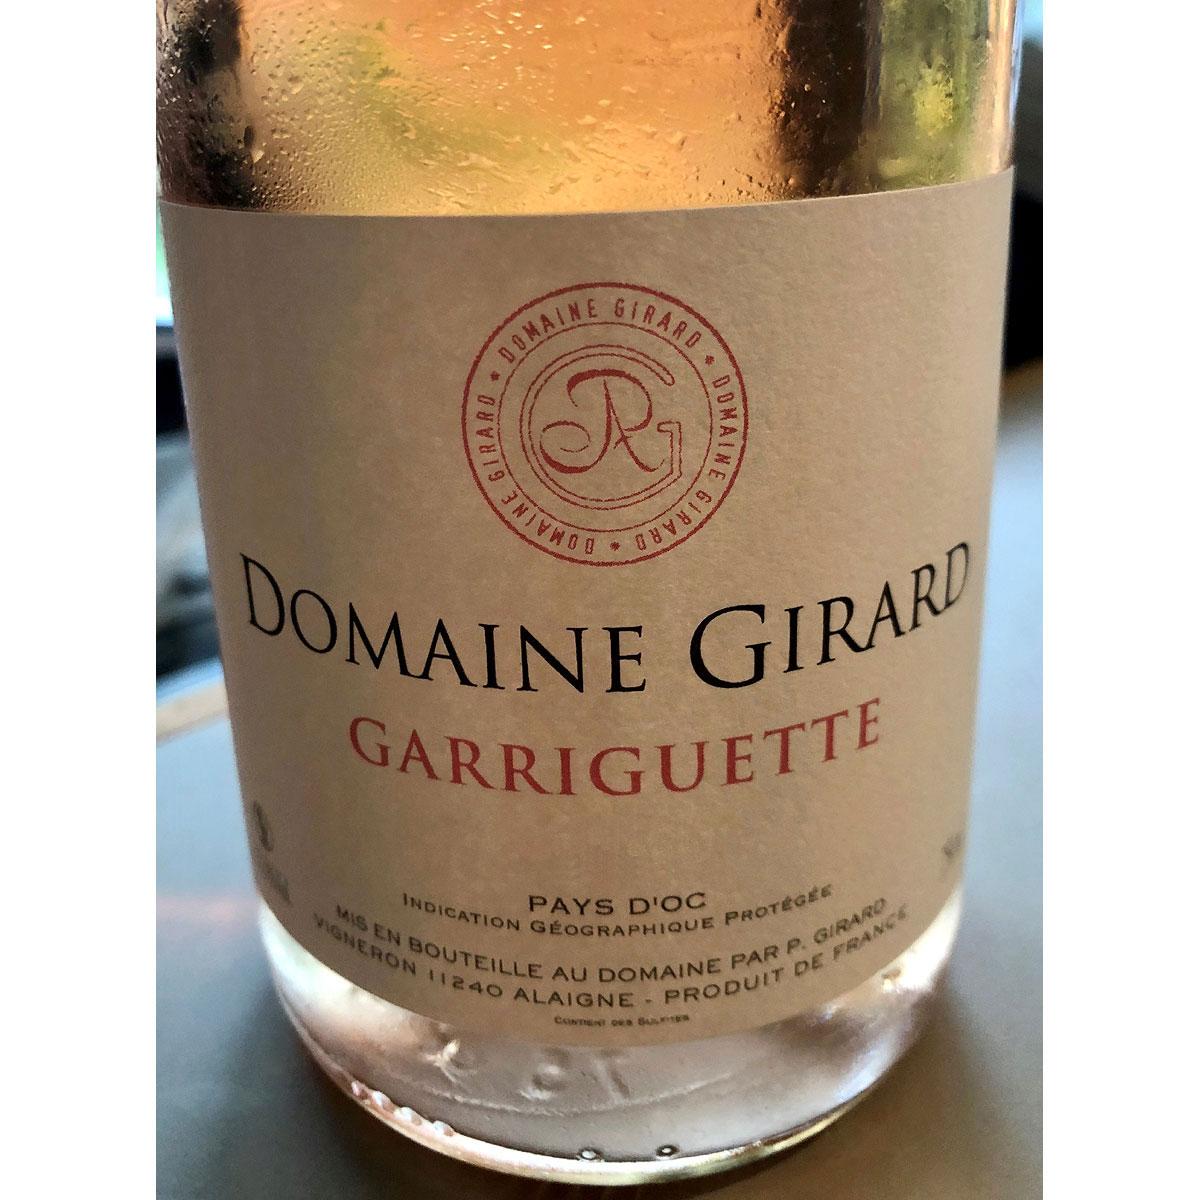 IGP Pays d'Oc: Domaine Girard 'Garriguette' Rosé 2020 - Lifestyle